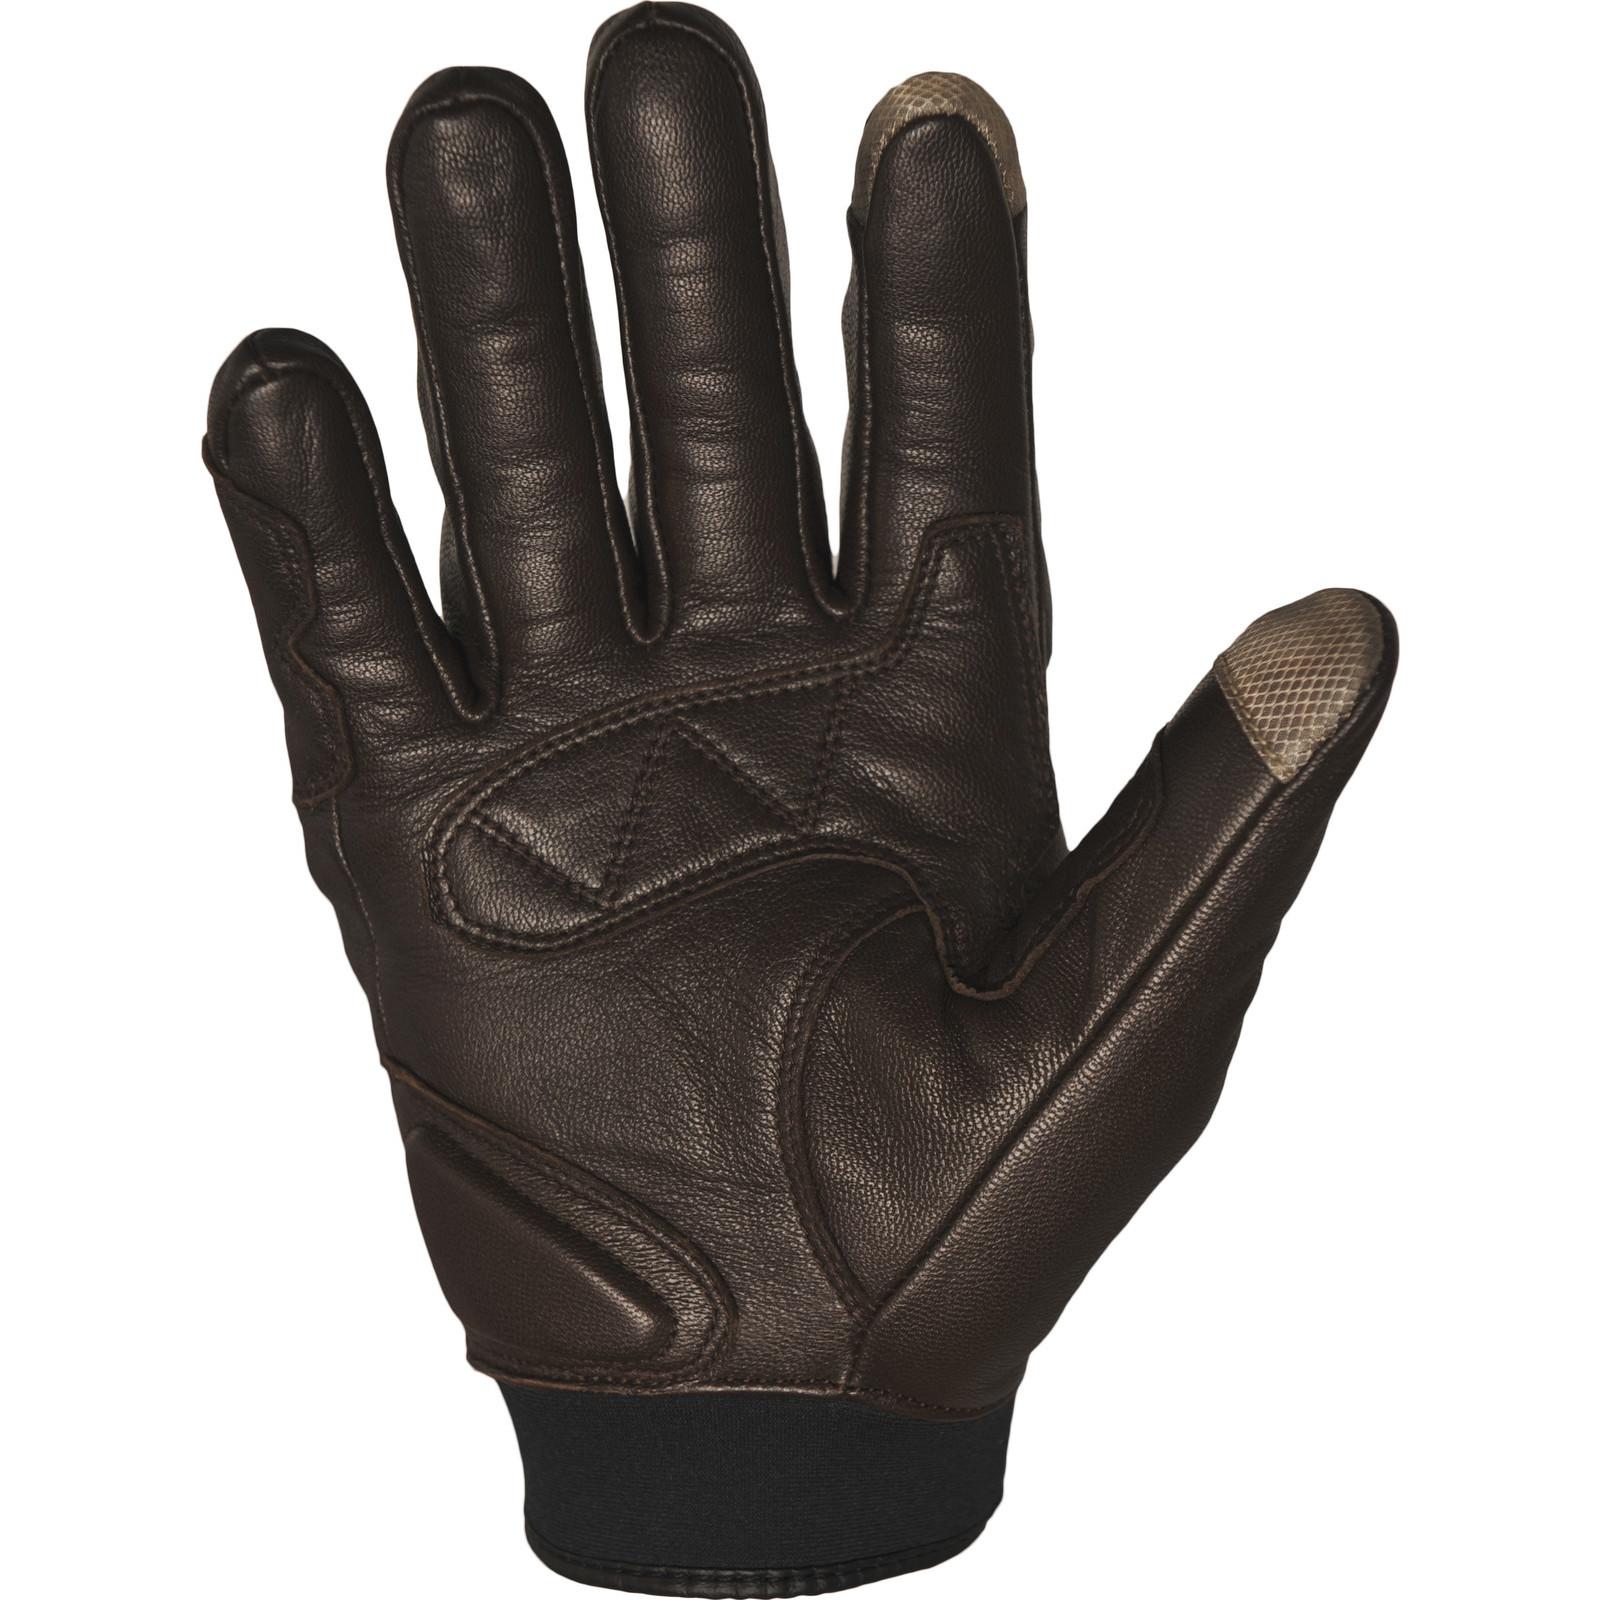 Motorcycle Gloves Textile - Richa cordoba motorcycle gloves leather textile vintage ce